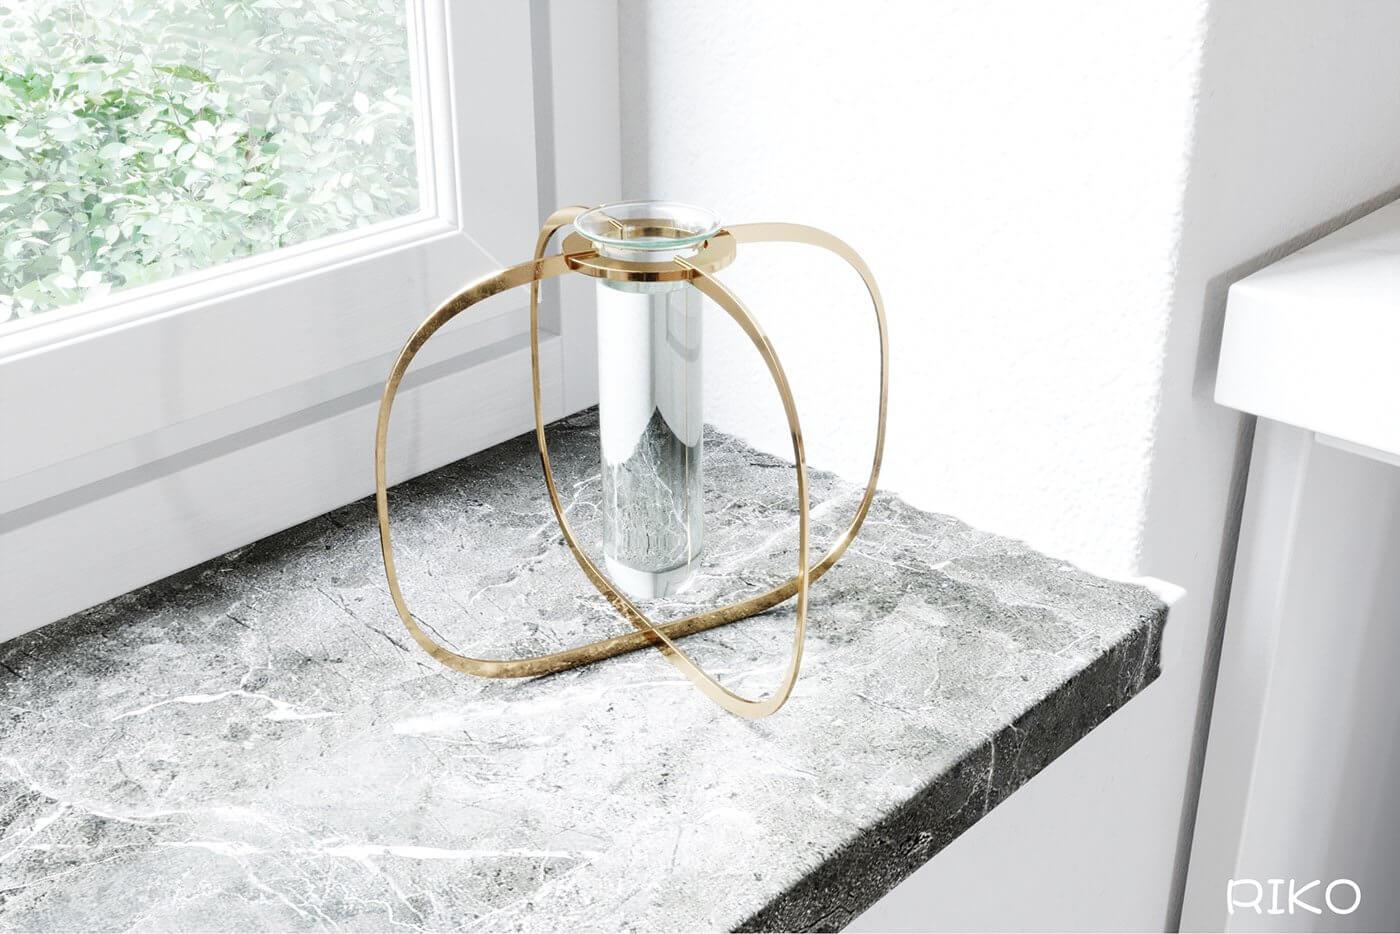 White kitchen design accessoires candle light - cgi visualization